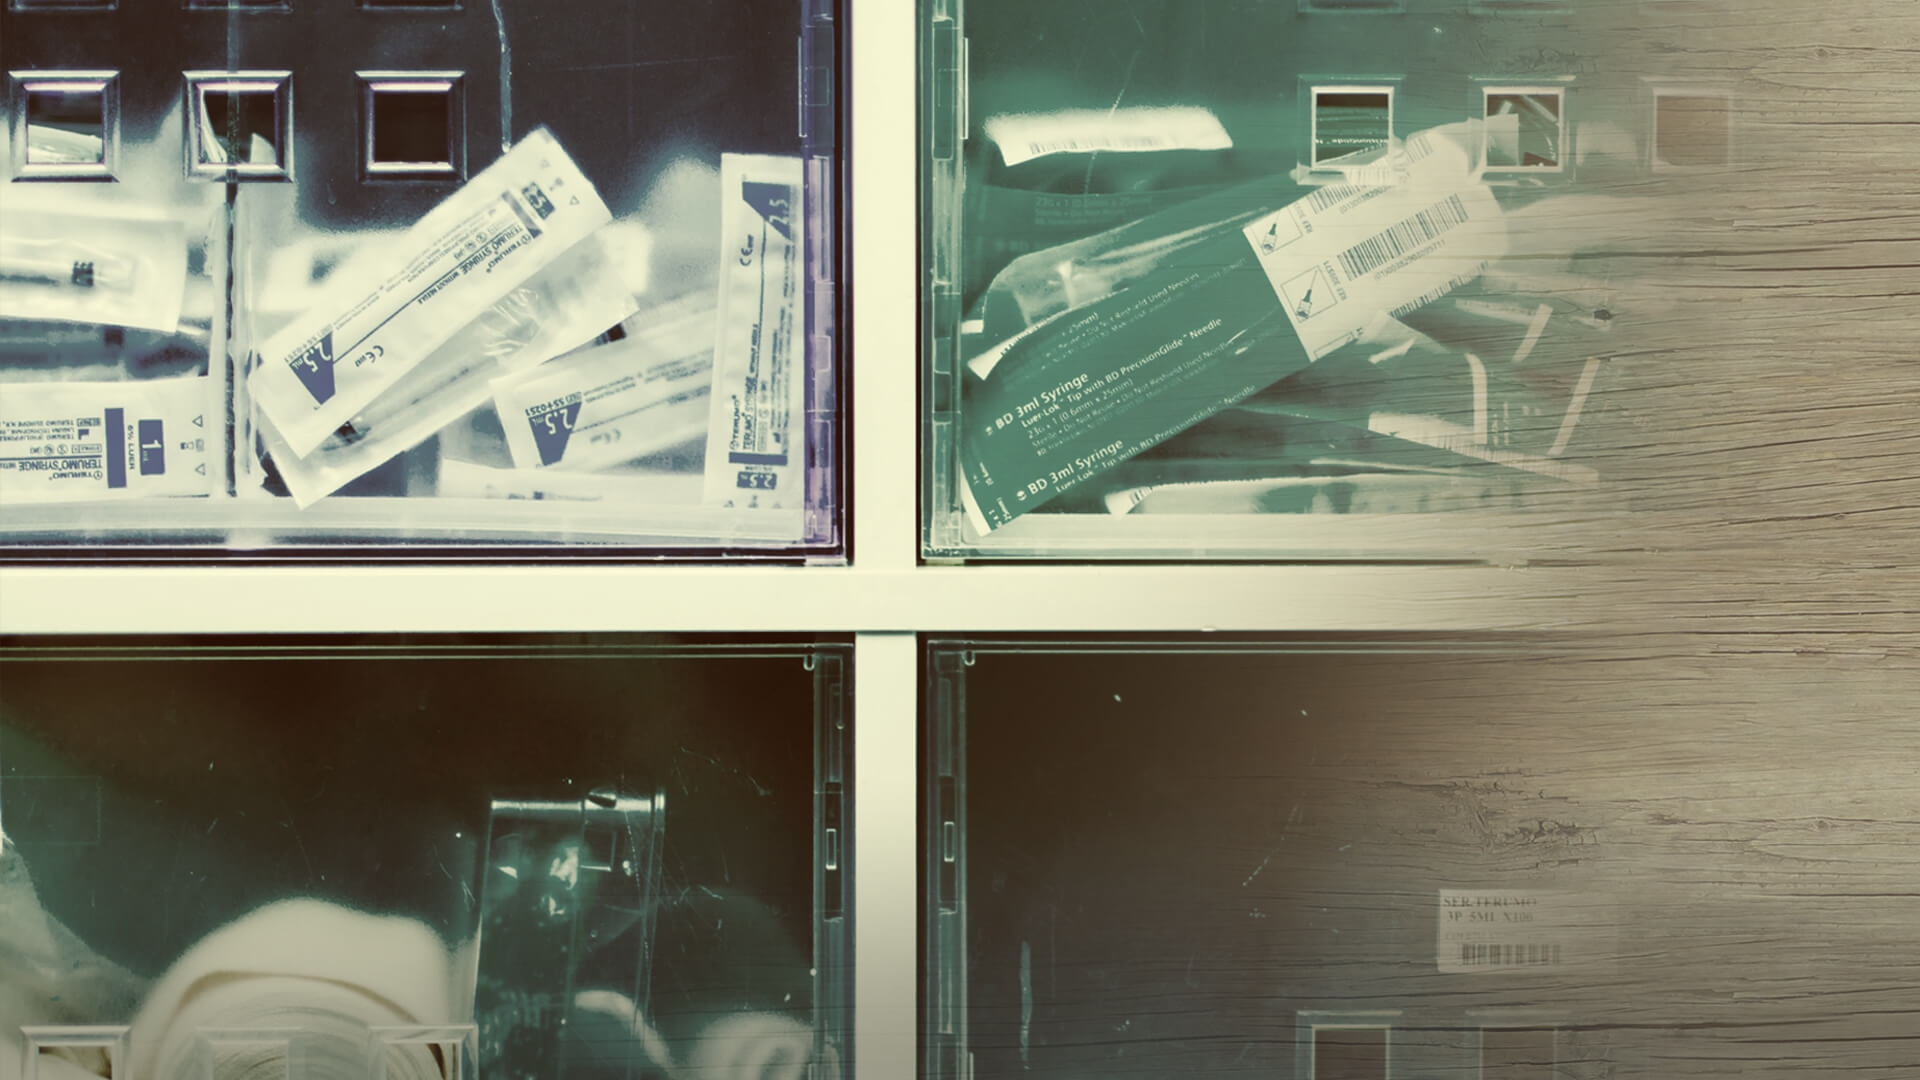 Cabinet de radiologie angers - Cabinet infirmier angers ...